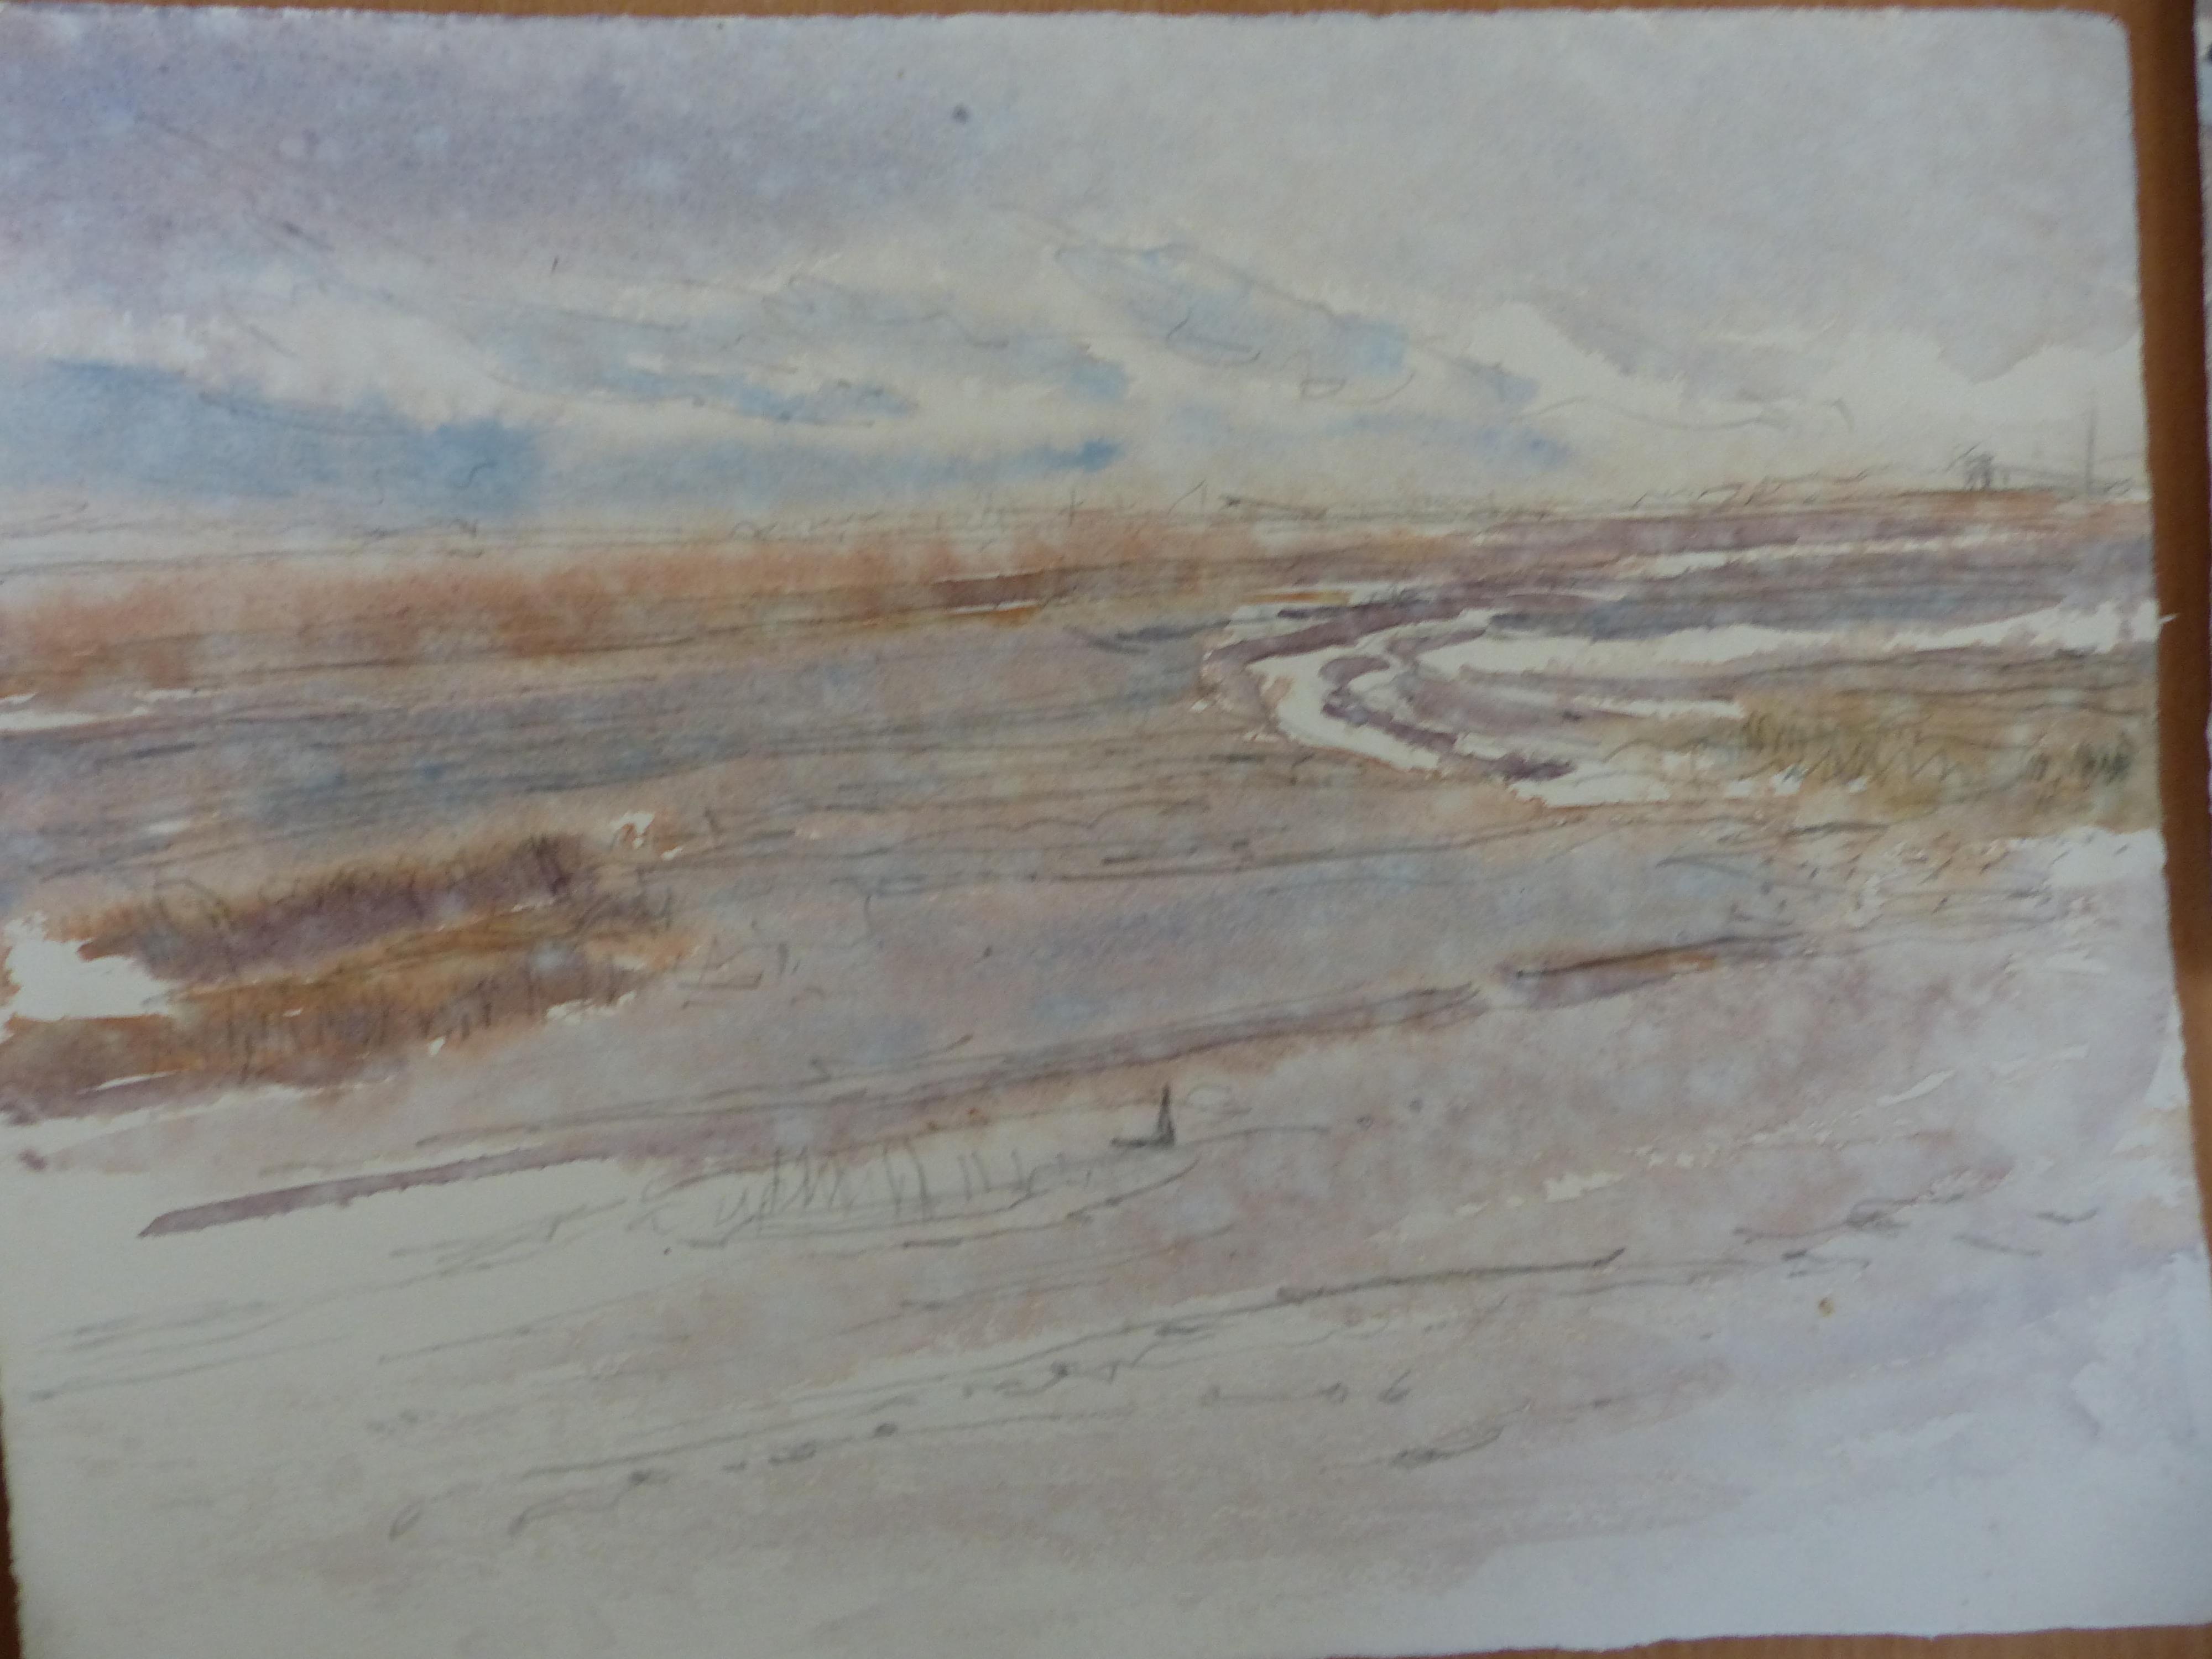 <p>Robert Greenhalf's rain-soaked watercolour</p>